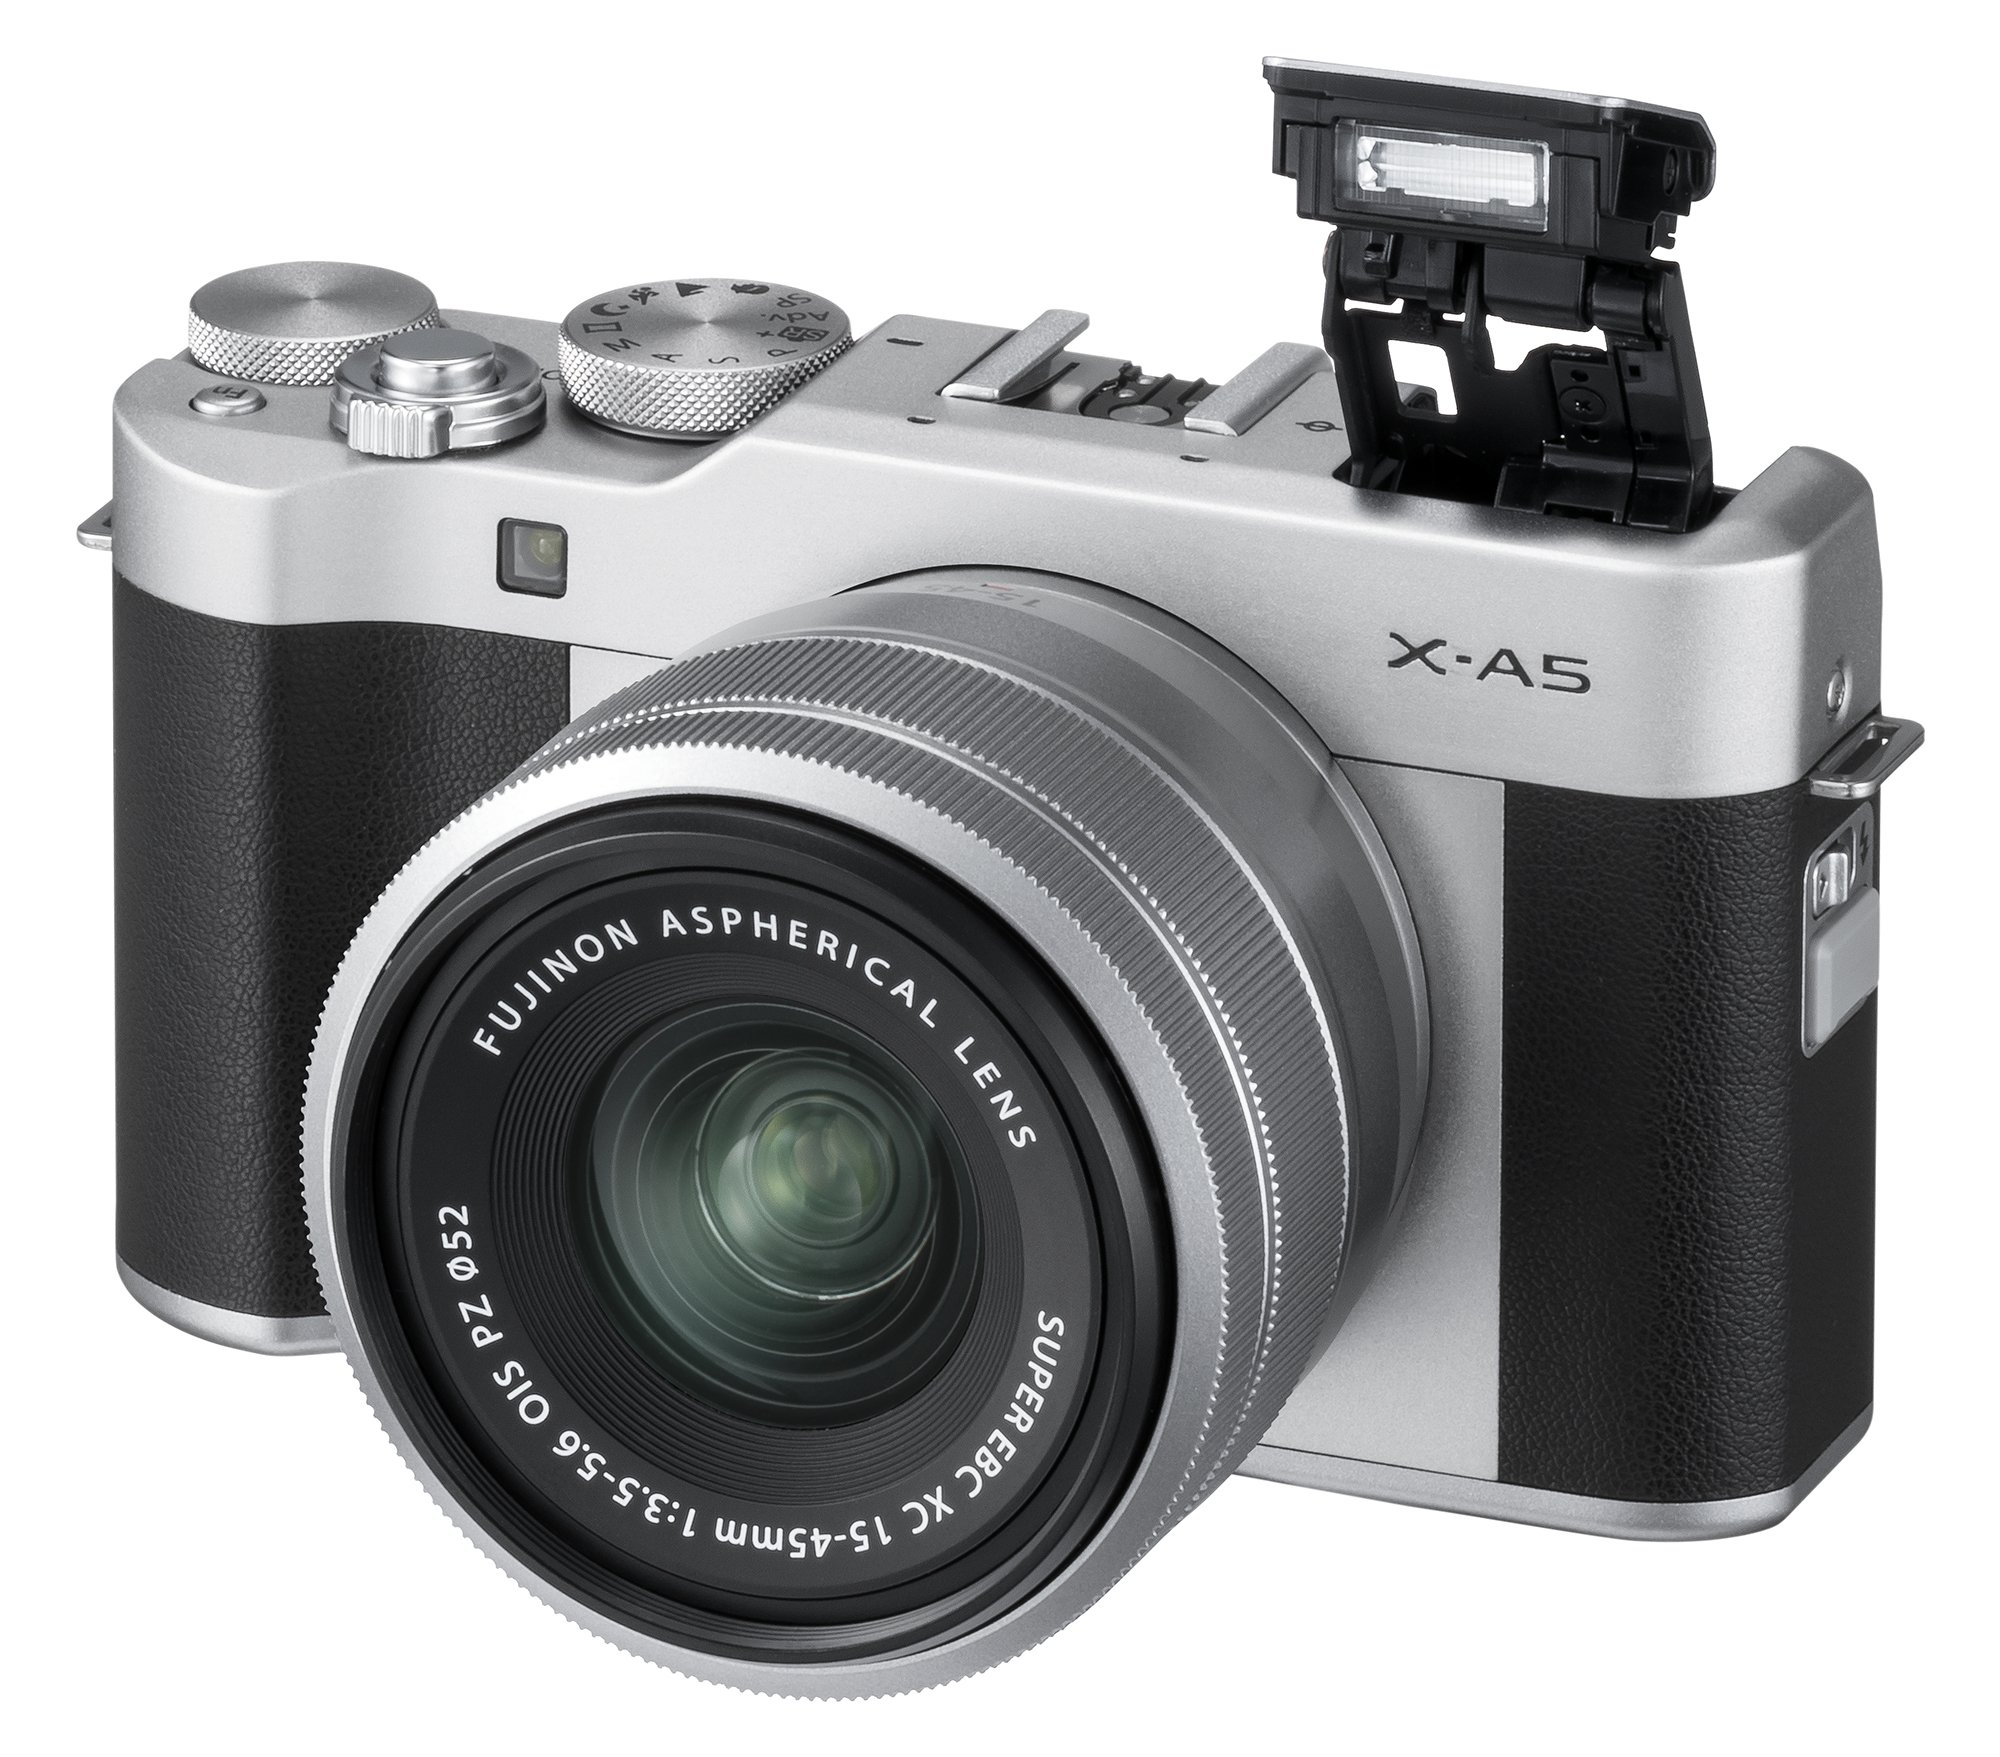 Fujifilm X-A5 Mirrorless Digital Camera w/XC15-45mmF3.5-5.6 OIS PZ Lens - Silver by Fujifilm (Image #7)